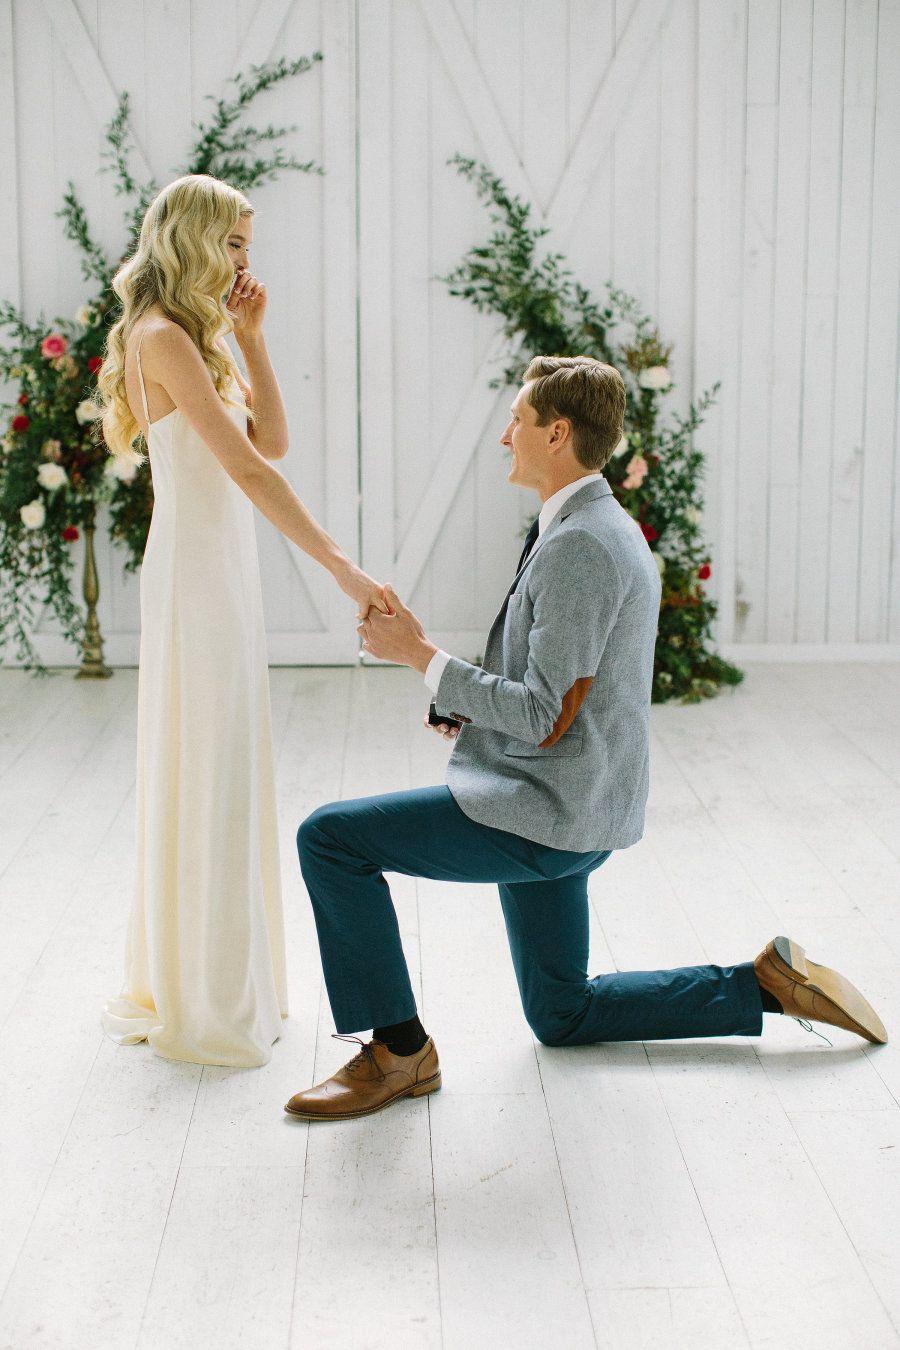 Surprise proposal: Photography: Ellen Ashton Photography - www.ellenashton.com/   Read More on SMP: http://www.stylemepretty.com/2017/03/08/garden-of-eden-inspired-shoot-ending-in-a-real-surprise-proposal/